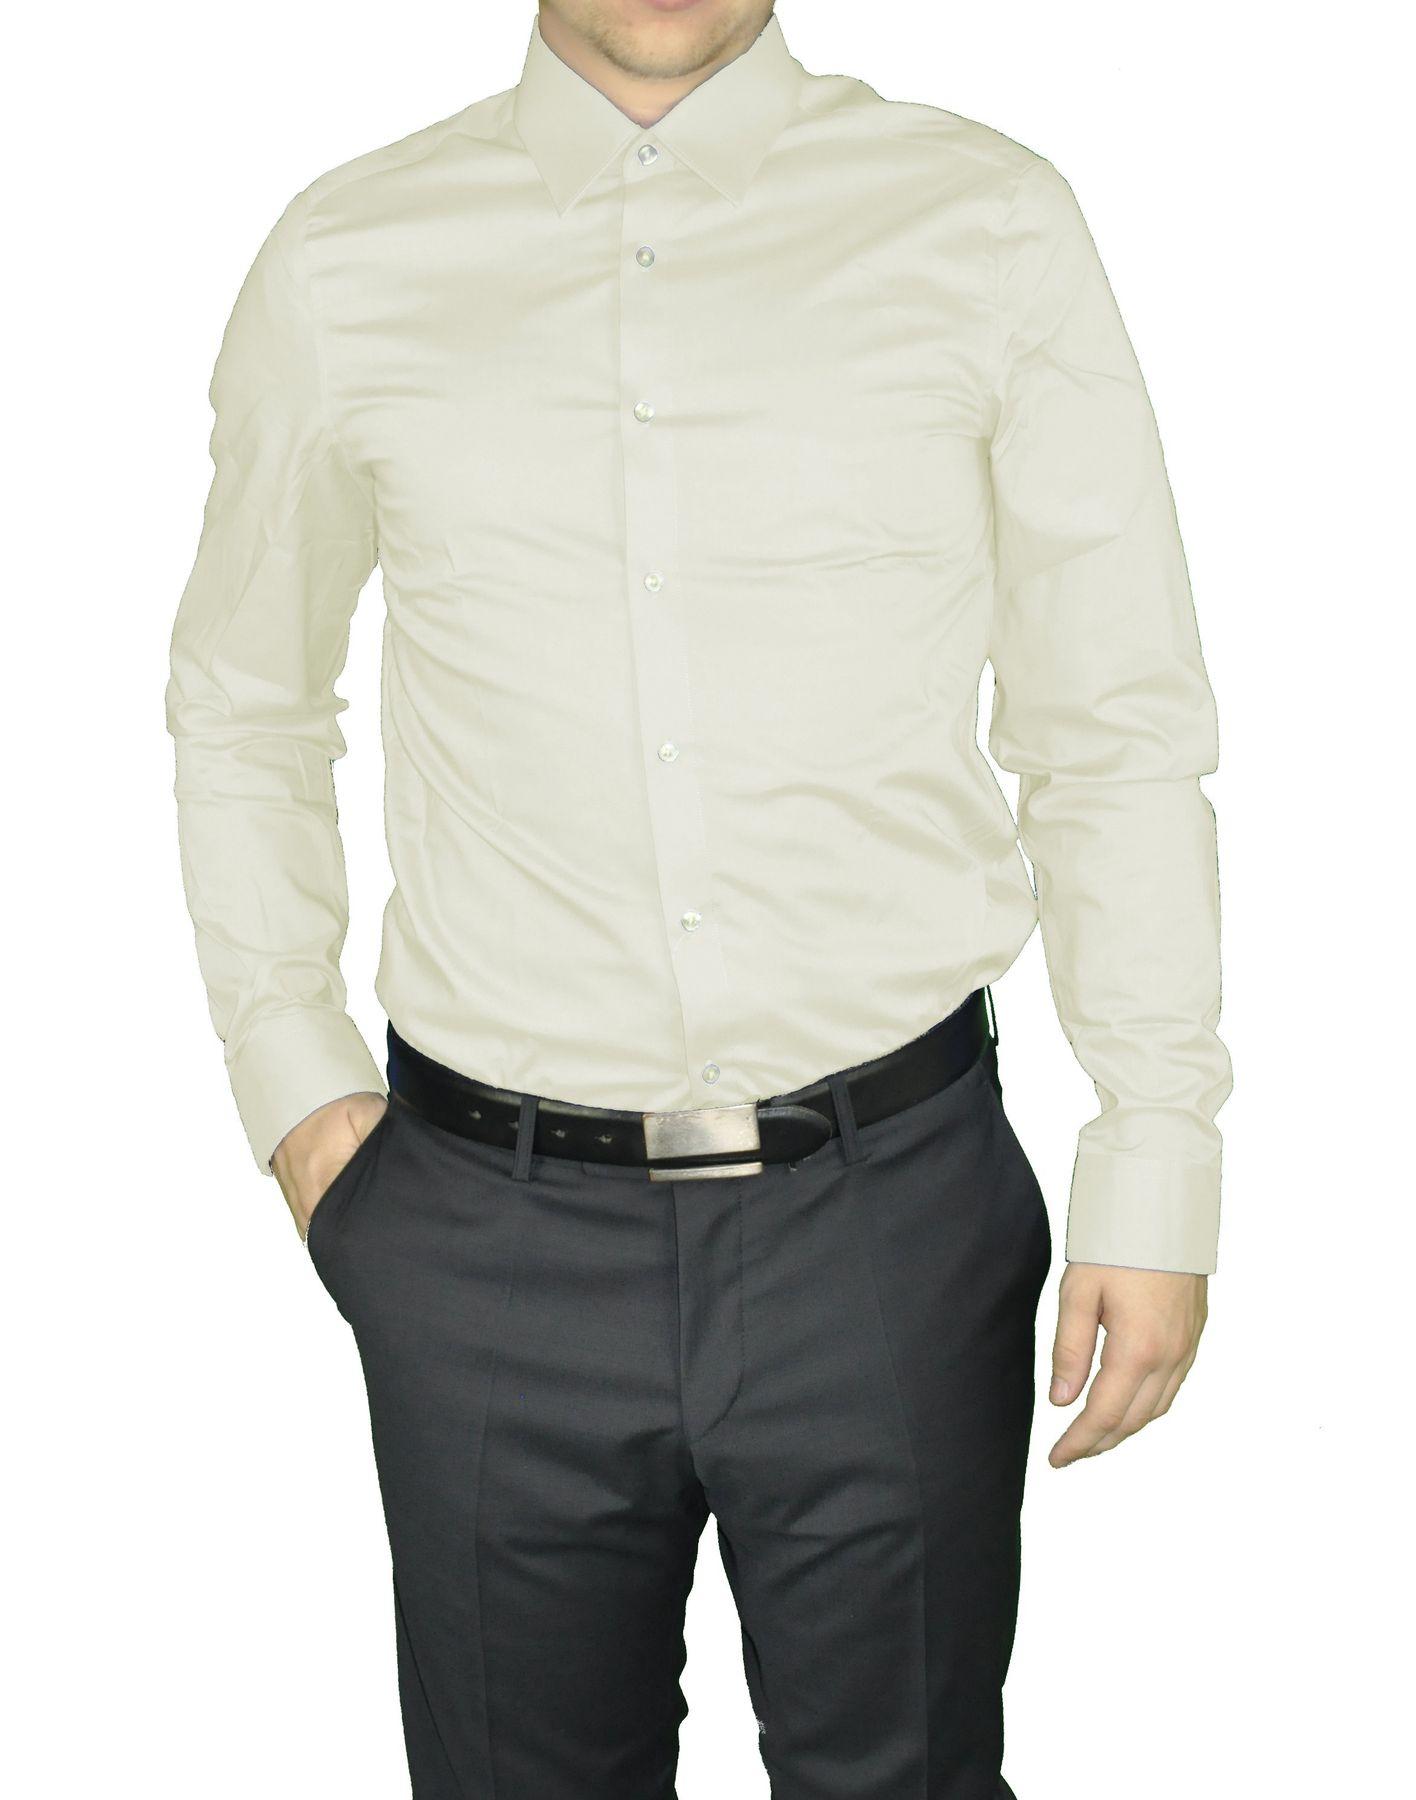 Redmond - Herren Slim Fit Hemd in verschiedenen Farben (400130/17A) – Bild 9